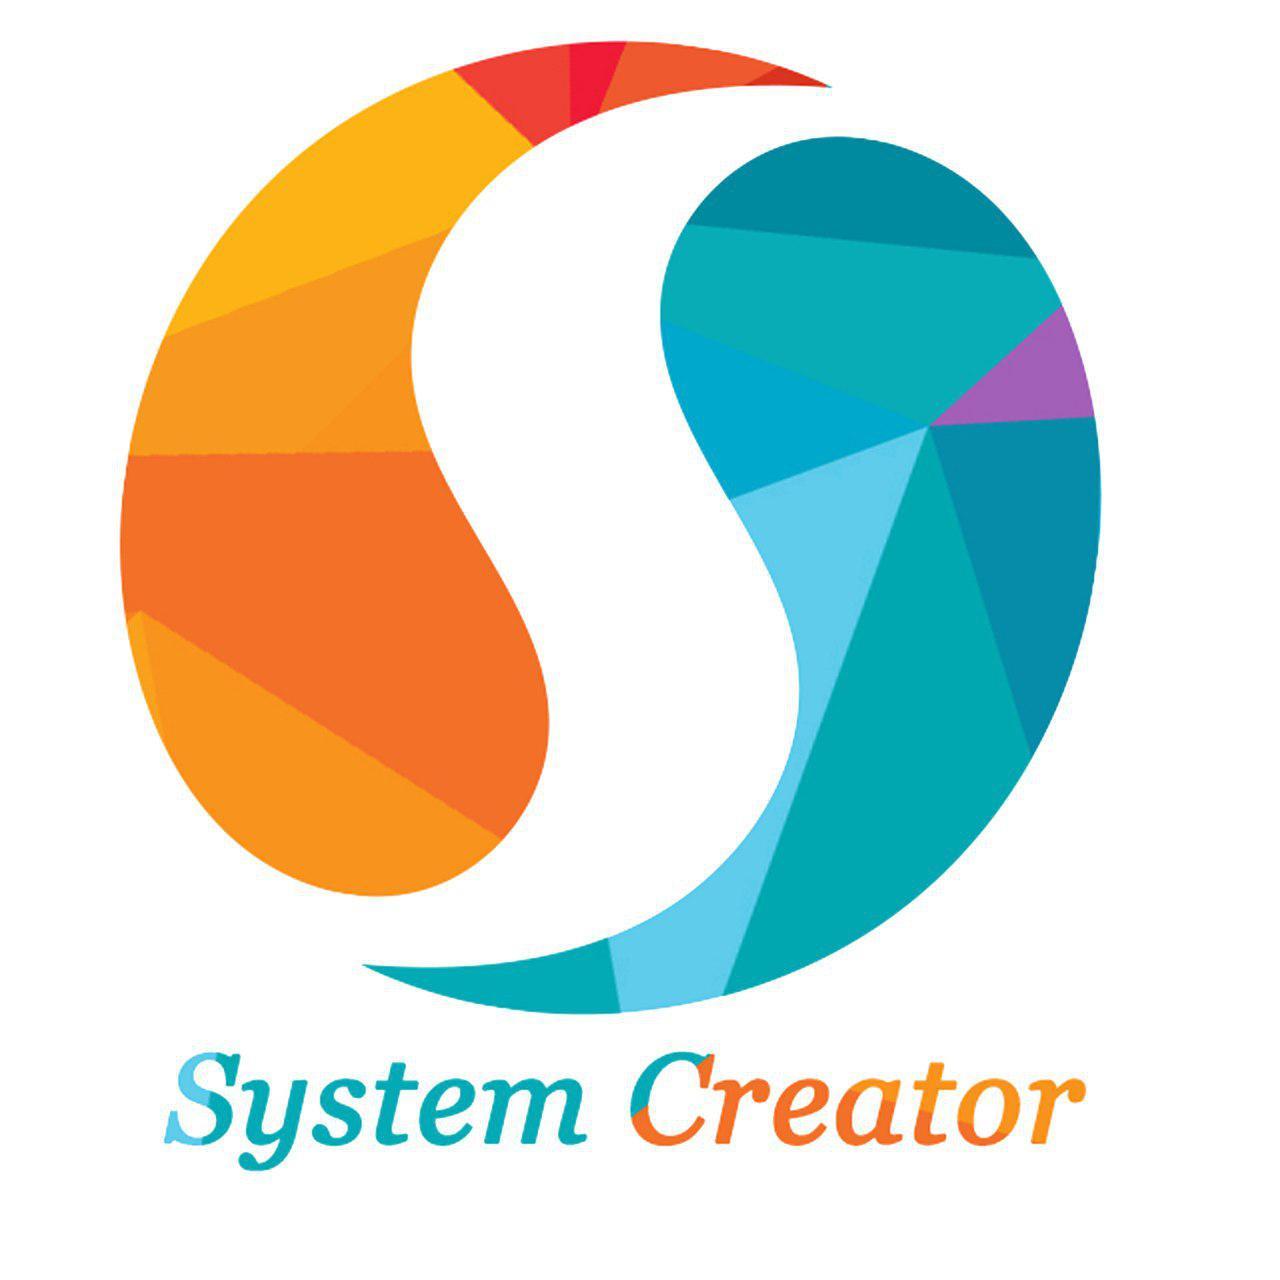 System Creator image